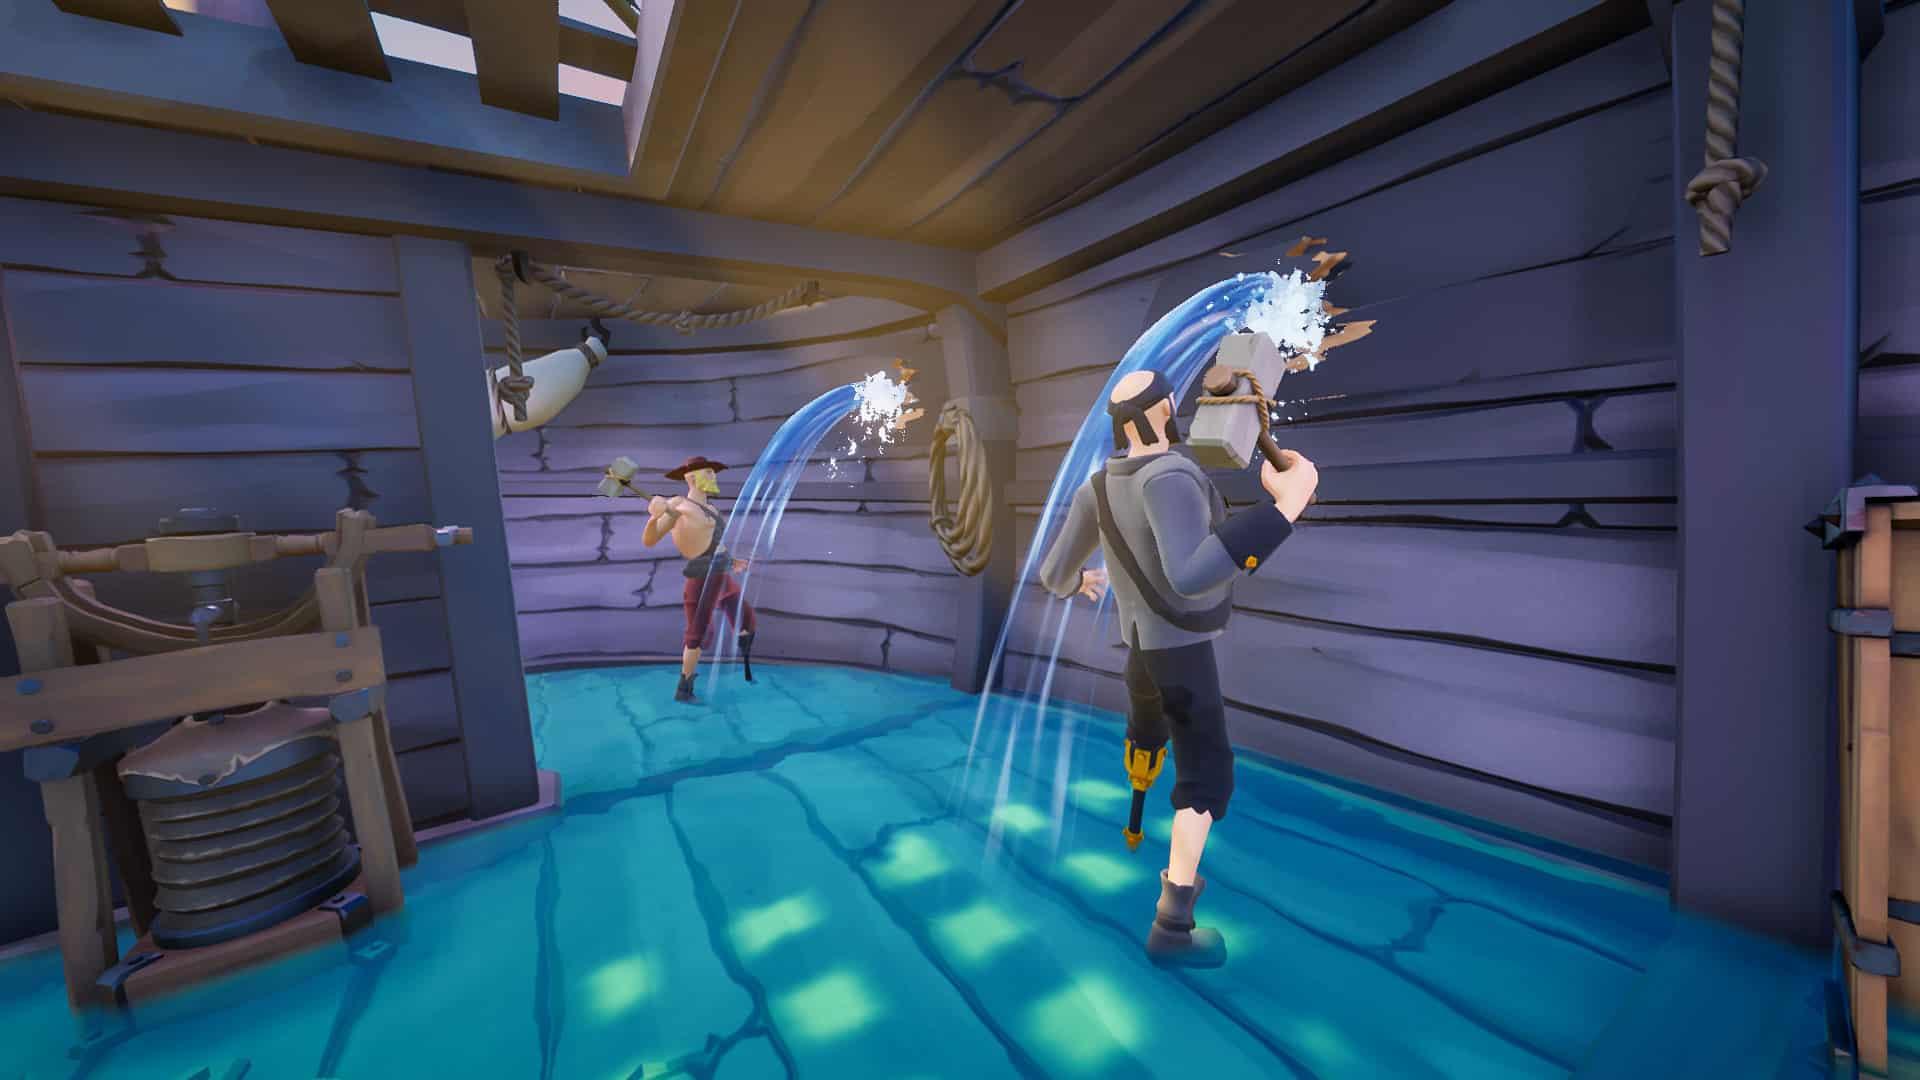 Blazing Sails Get Up Games Iceberg Interactive future battle royale evolution iteration